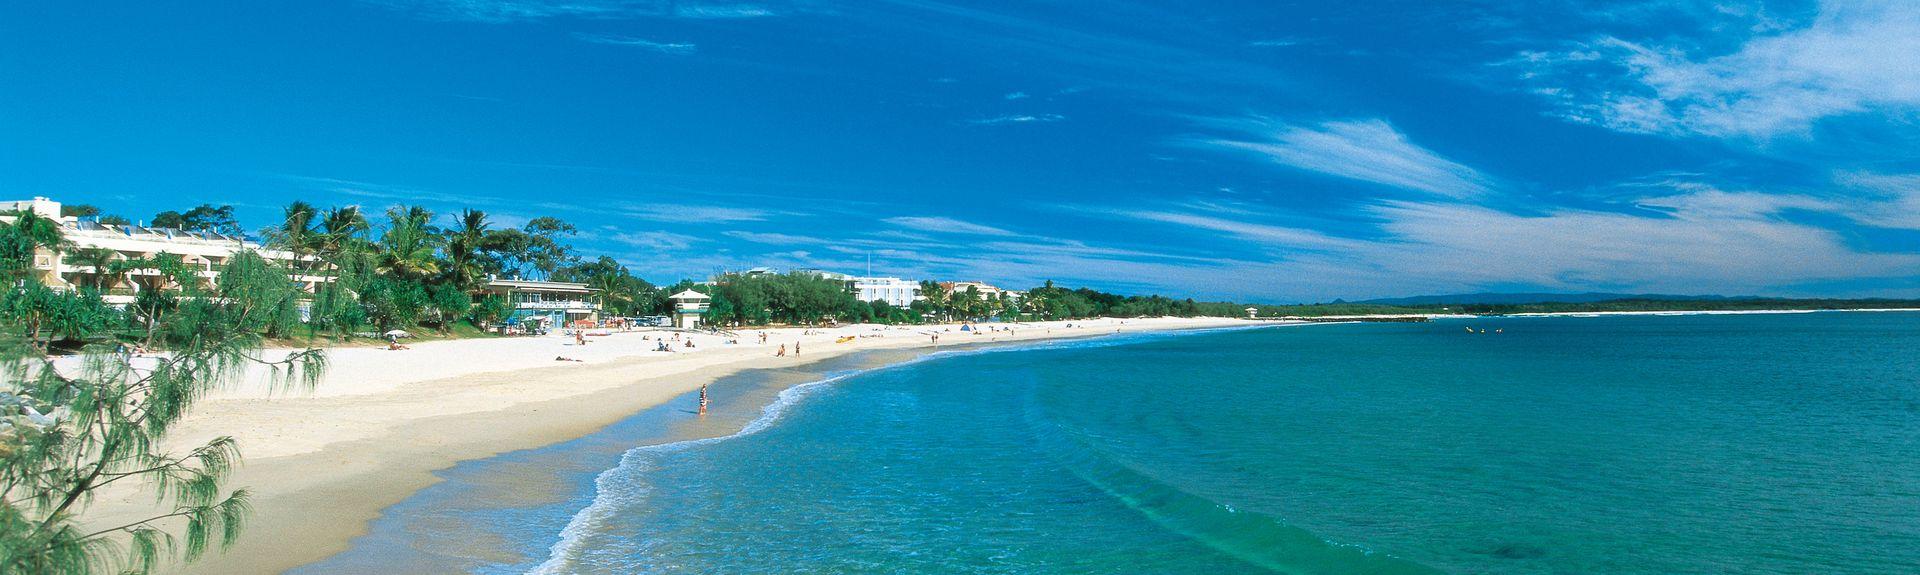 Little Cove, Noosa Heads QLD, Australia